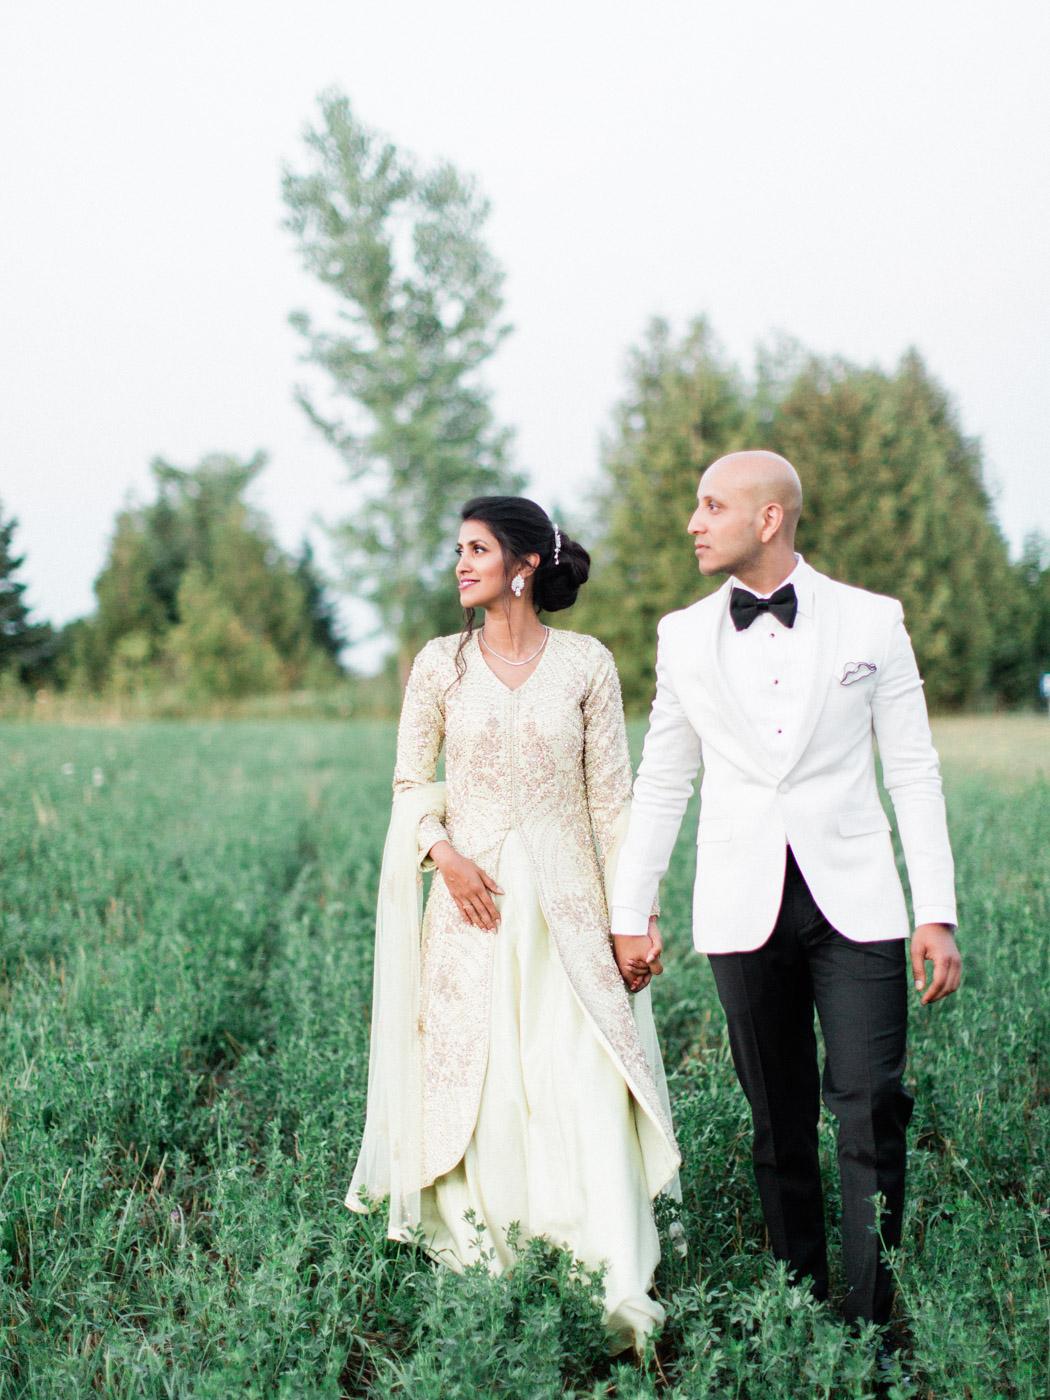 Toronto-Collingwood-wedding-photographer-indian-wedding-documentary179.jpg